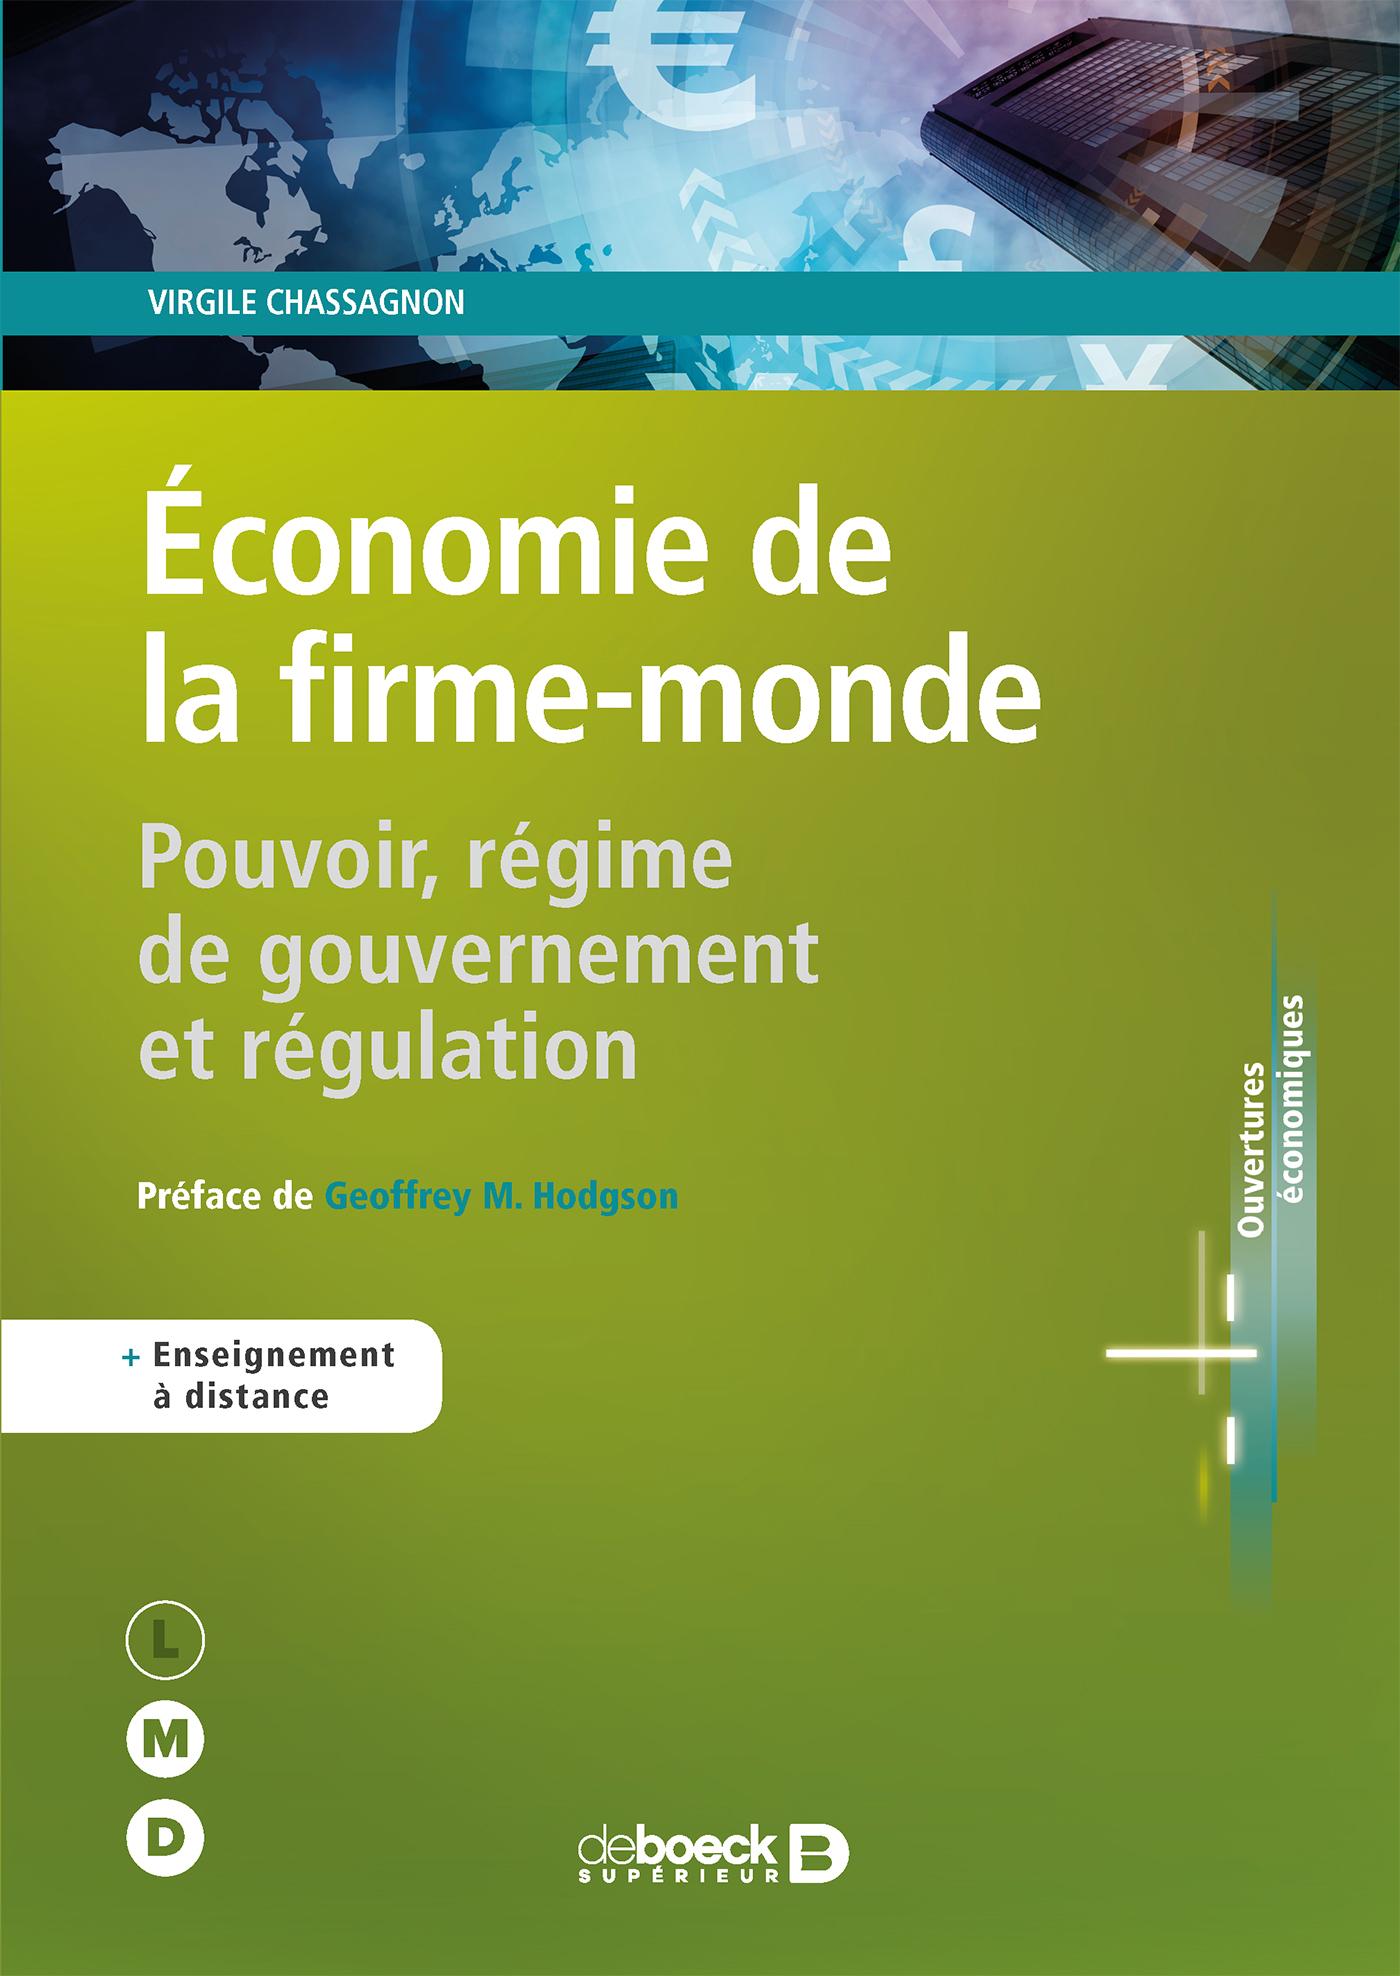 ECONOMIE DE LA FIRME-MONDE